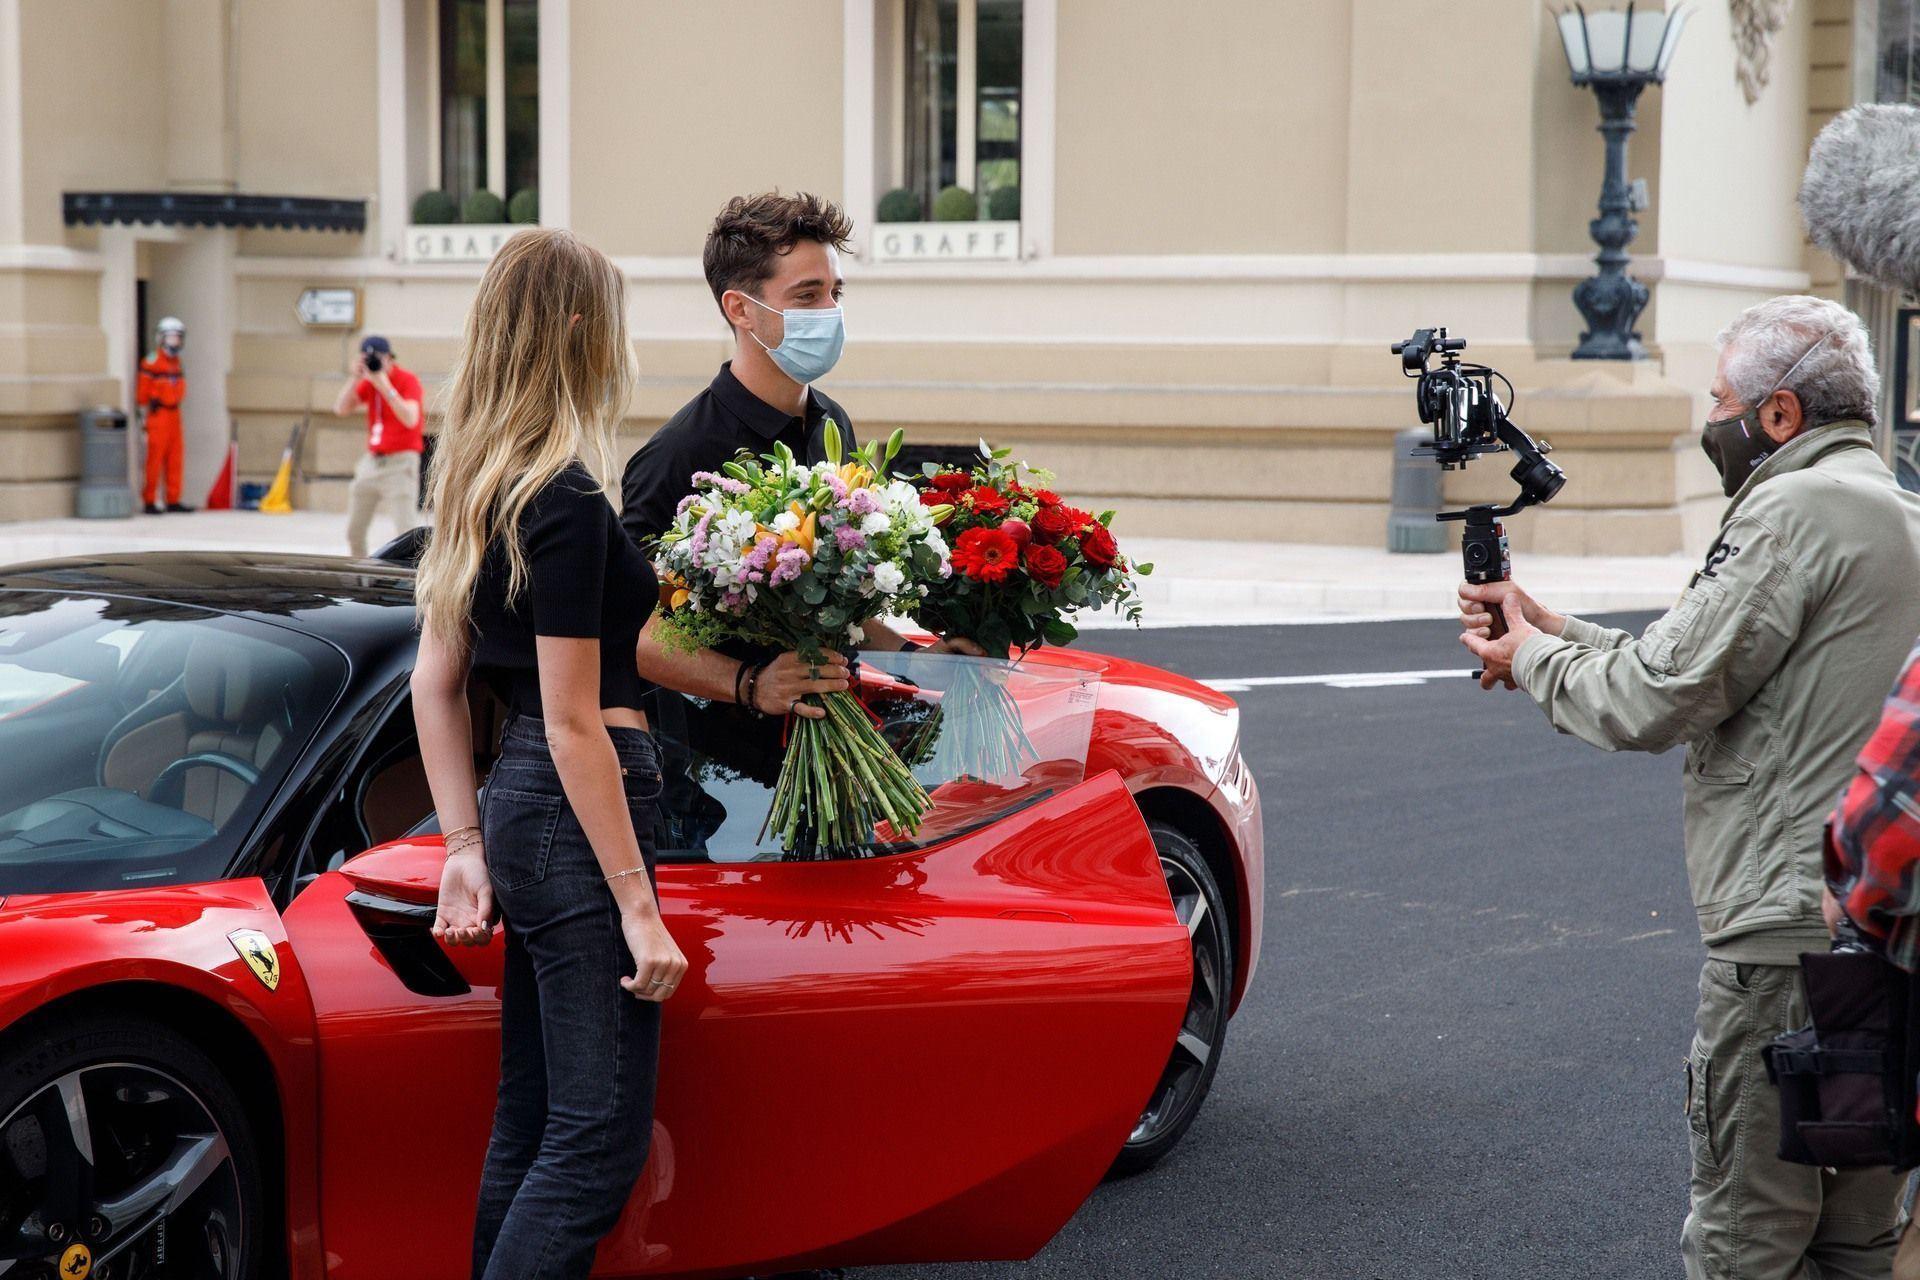 Ferrari_SF90_Stradale_Claude_Charles_Leclerc_Monaco_2020_0004